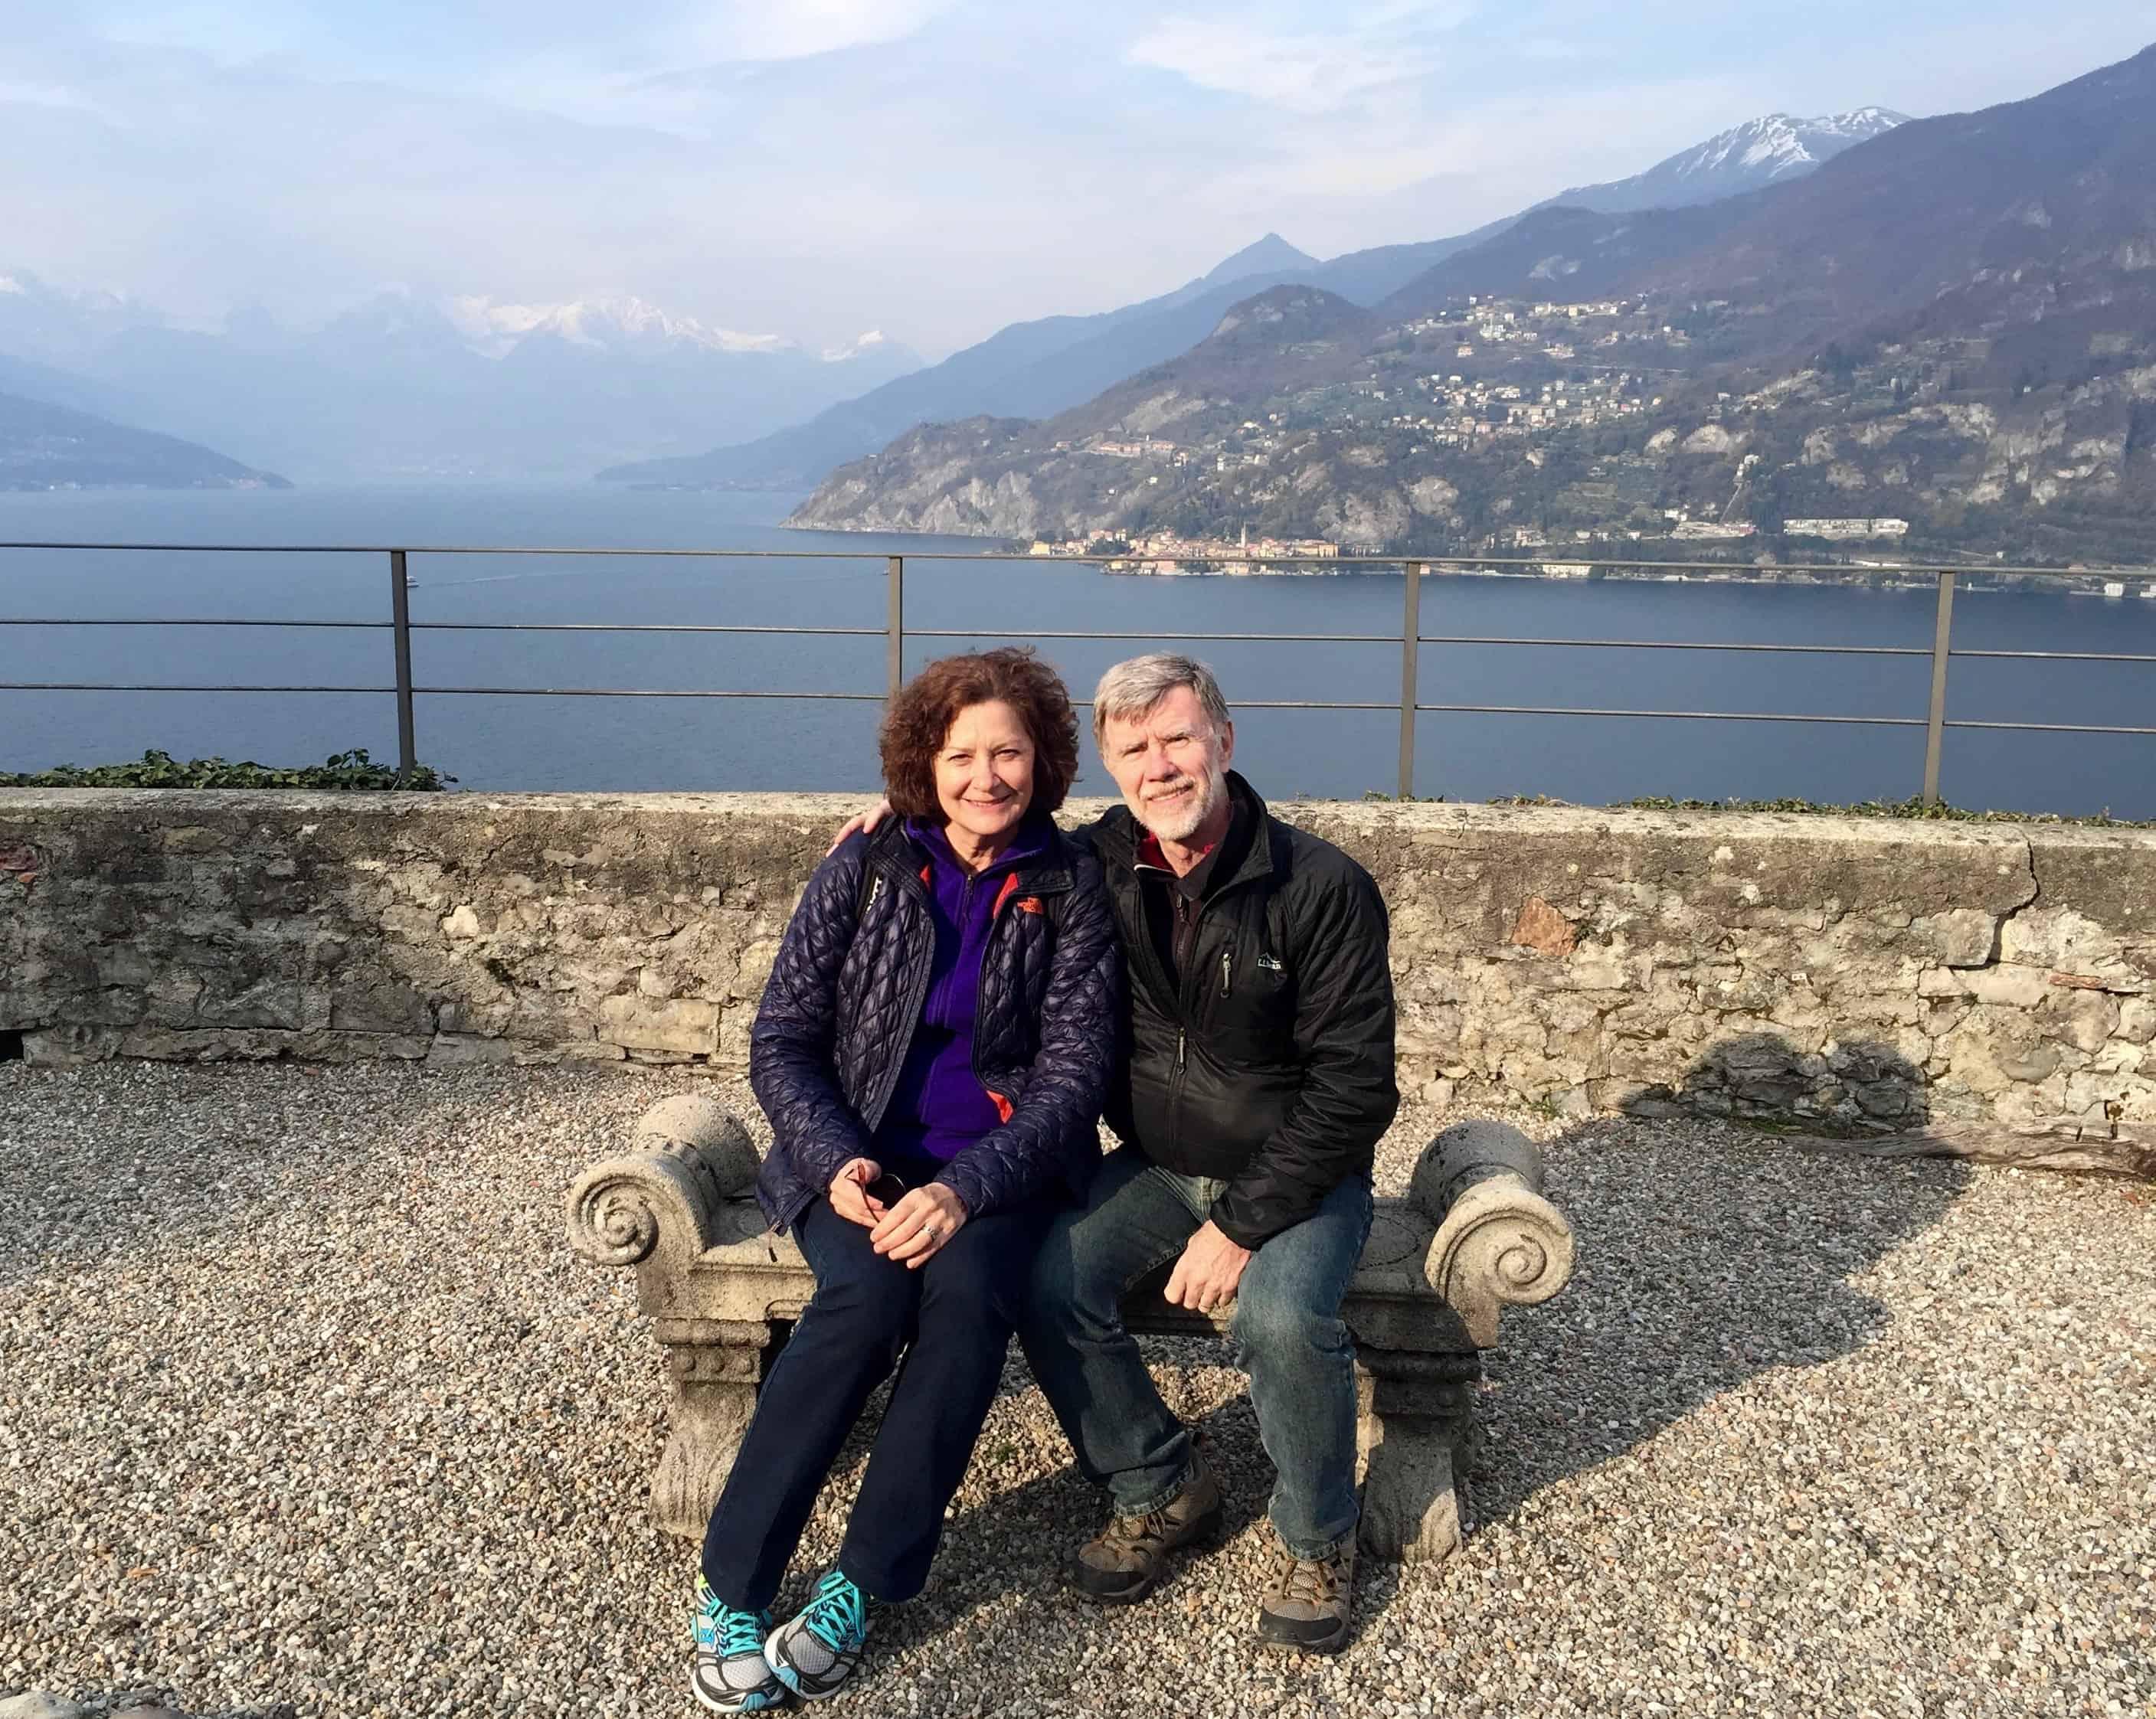 Julie and Steve at the Villa Serbelloni